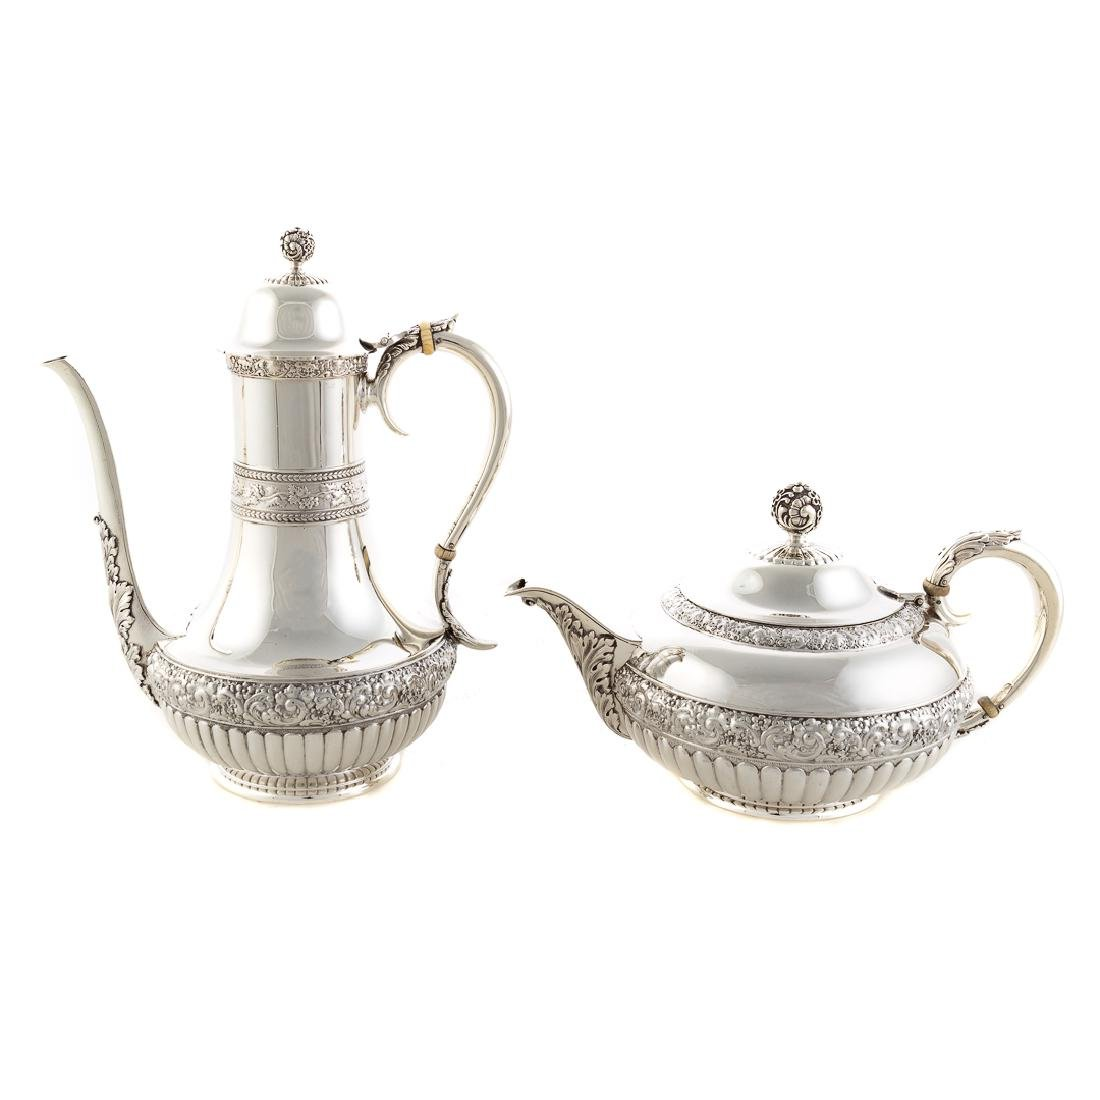 Very fine Tiffany sterling coffee & tea service - 7